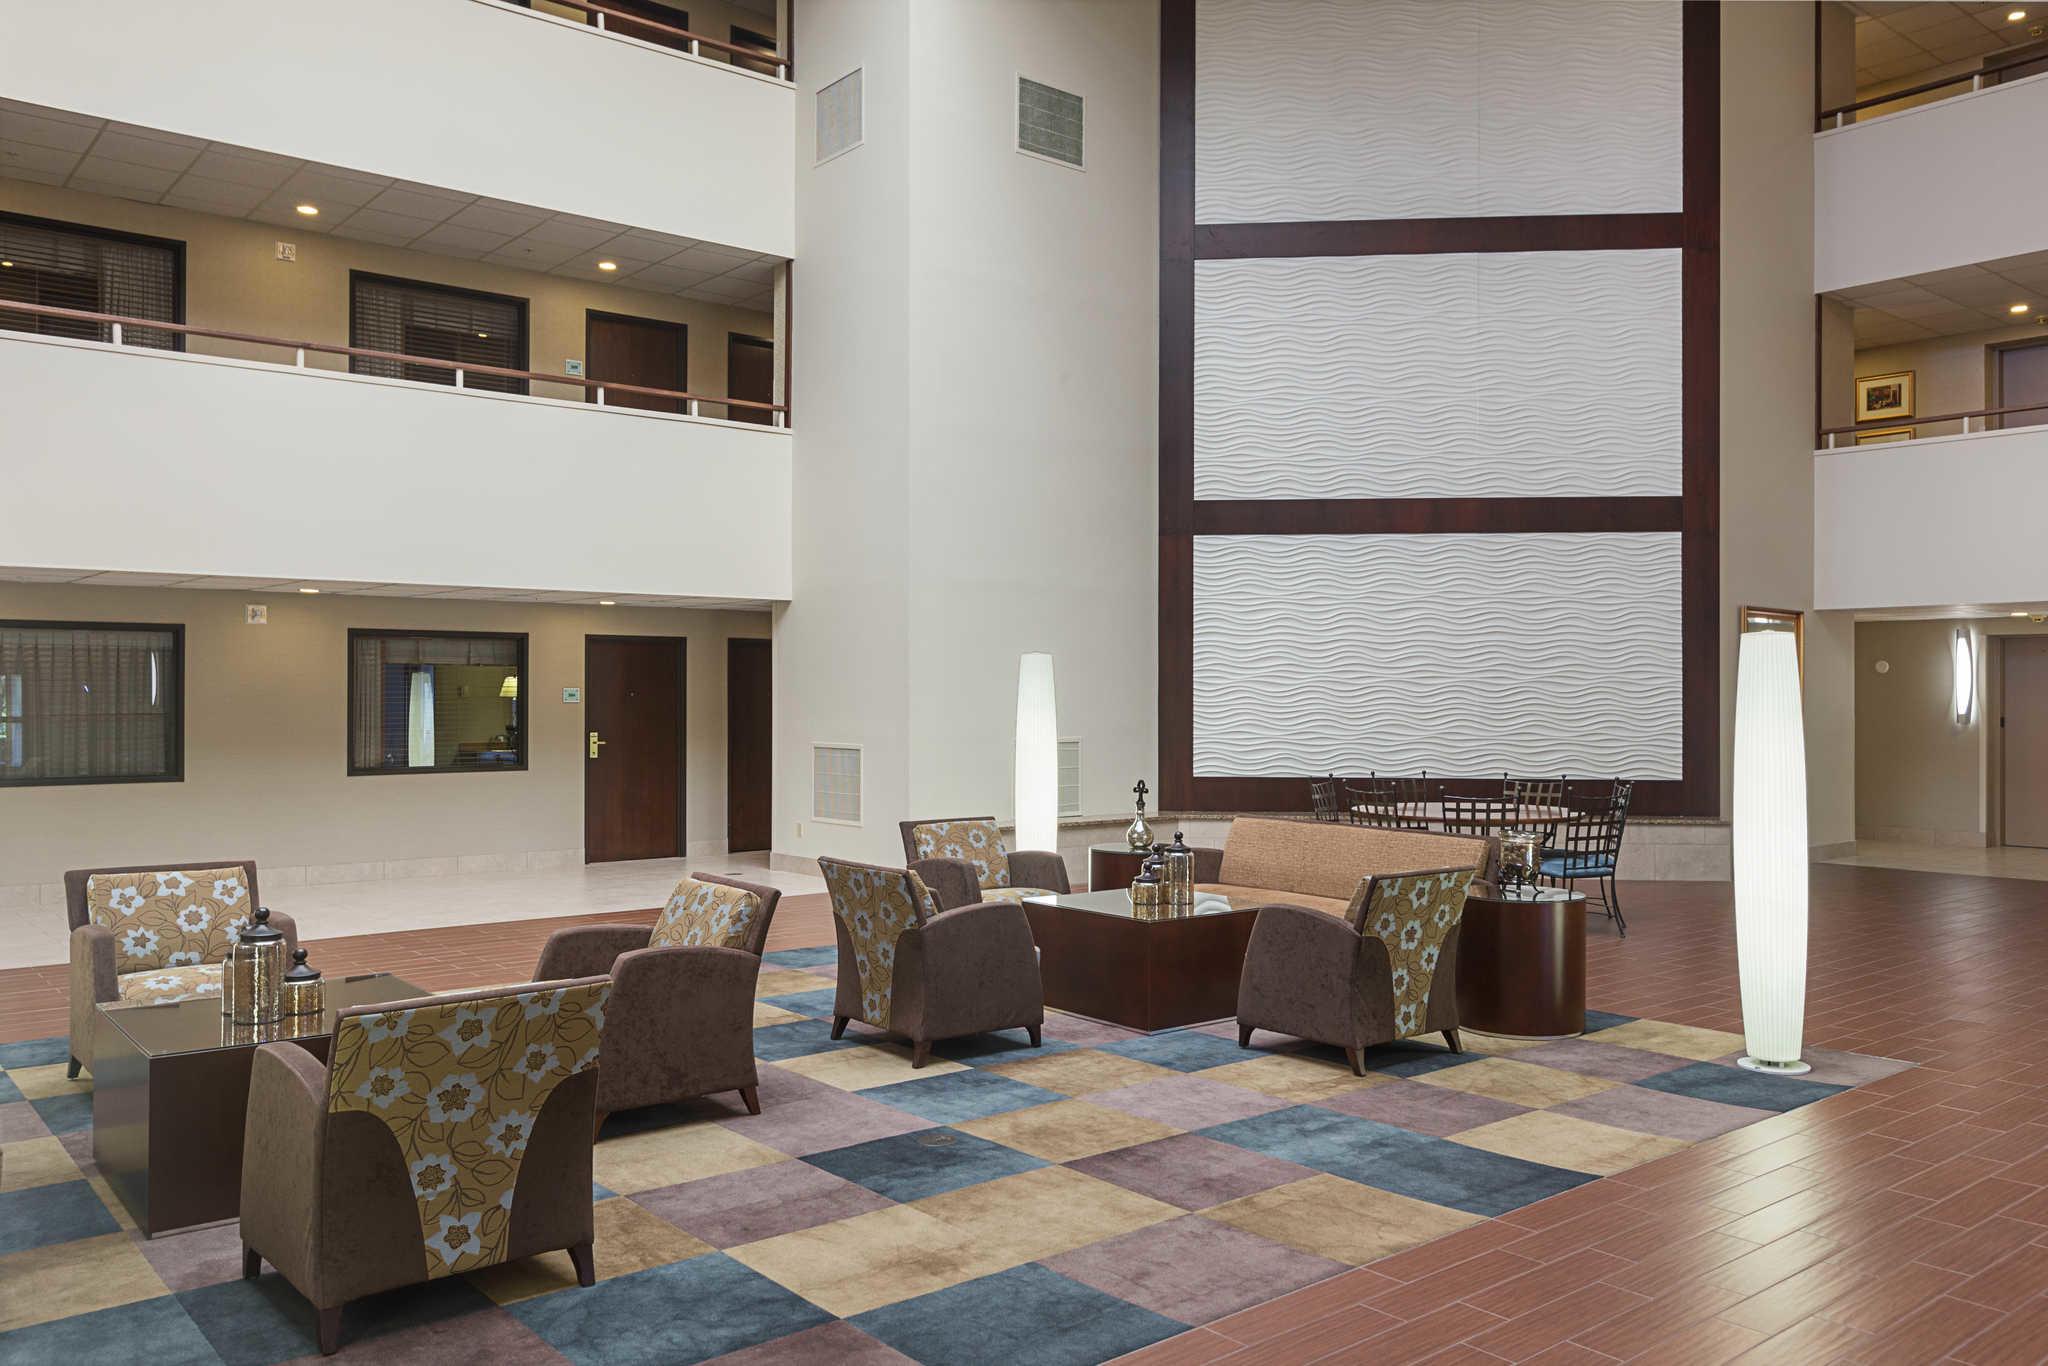 Quality Suites image 9